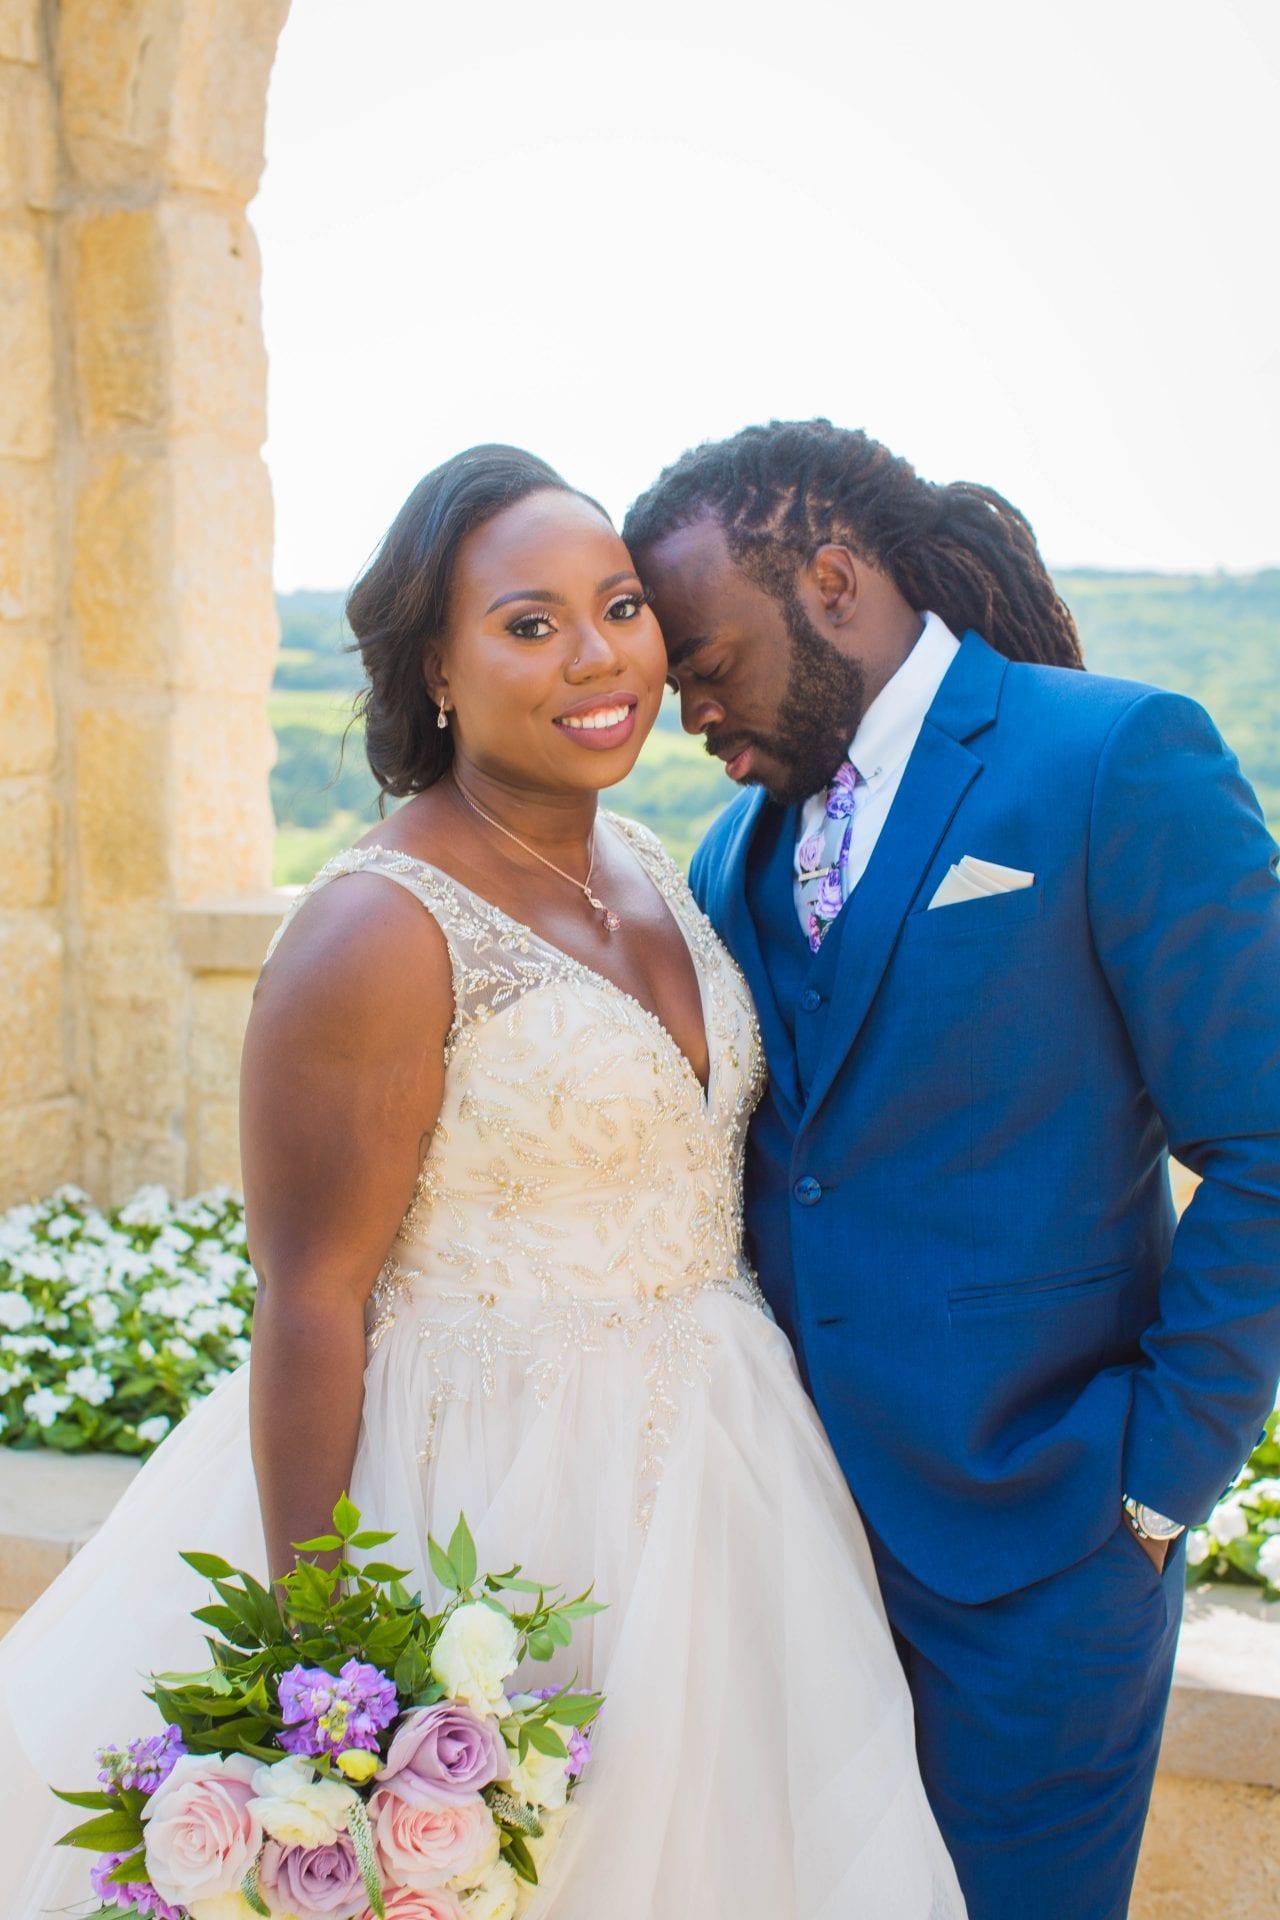 Onyema wedding La Cantera bride looking couple photo